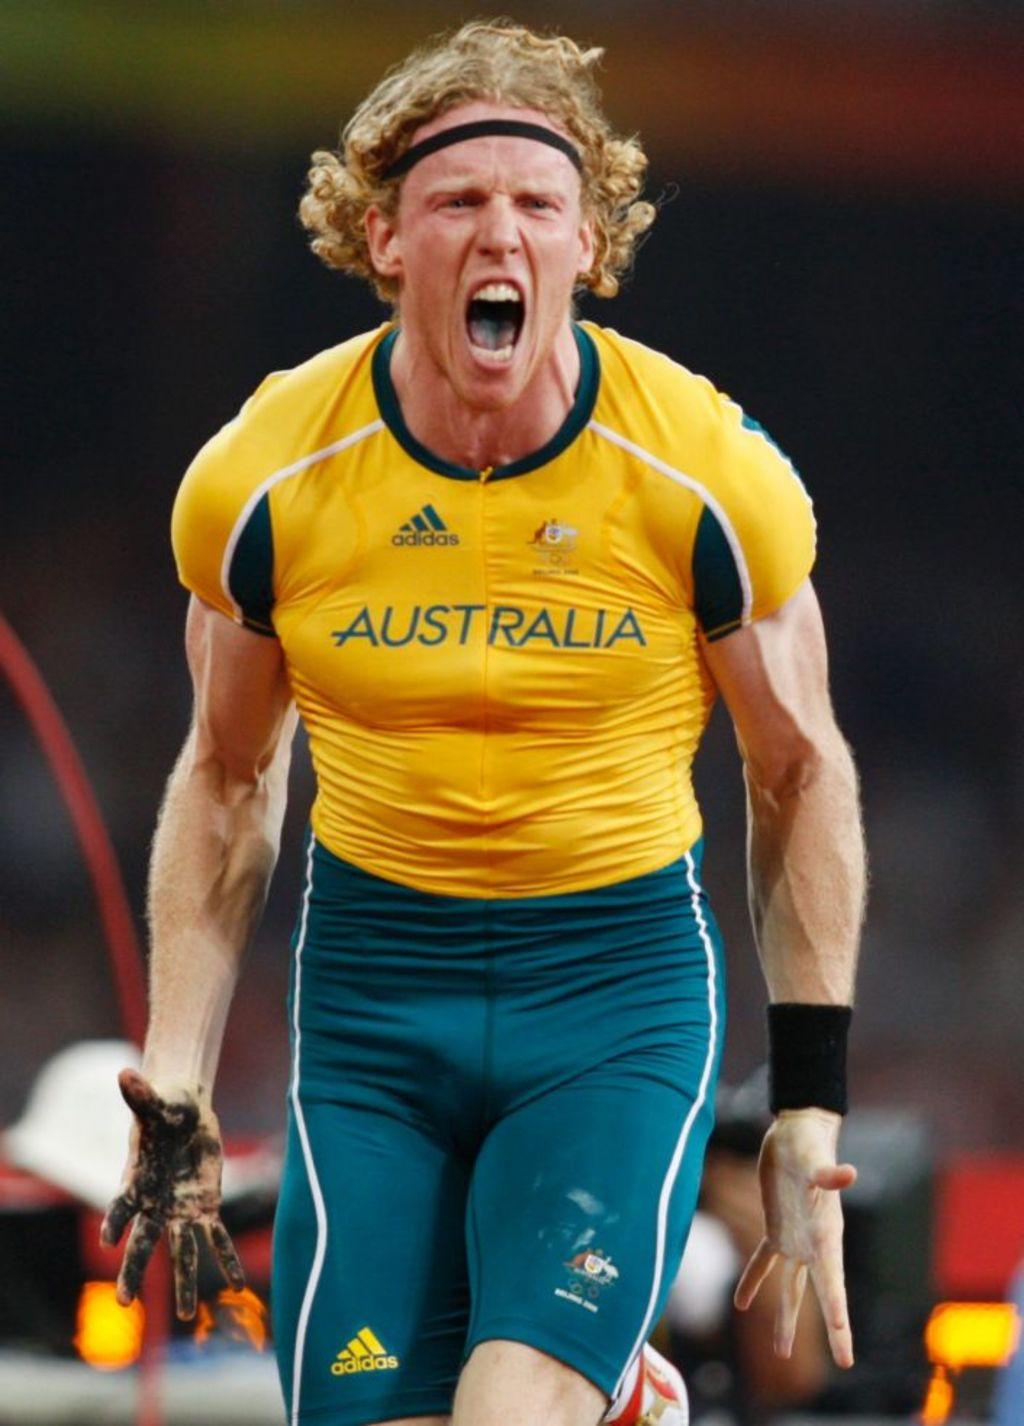 Steve Hooker, moments after winning gold in the 2008 Beijing Olympics. Photo: Greg Baker